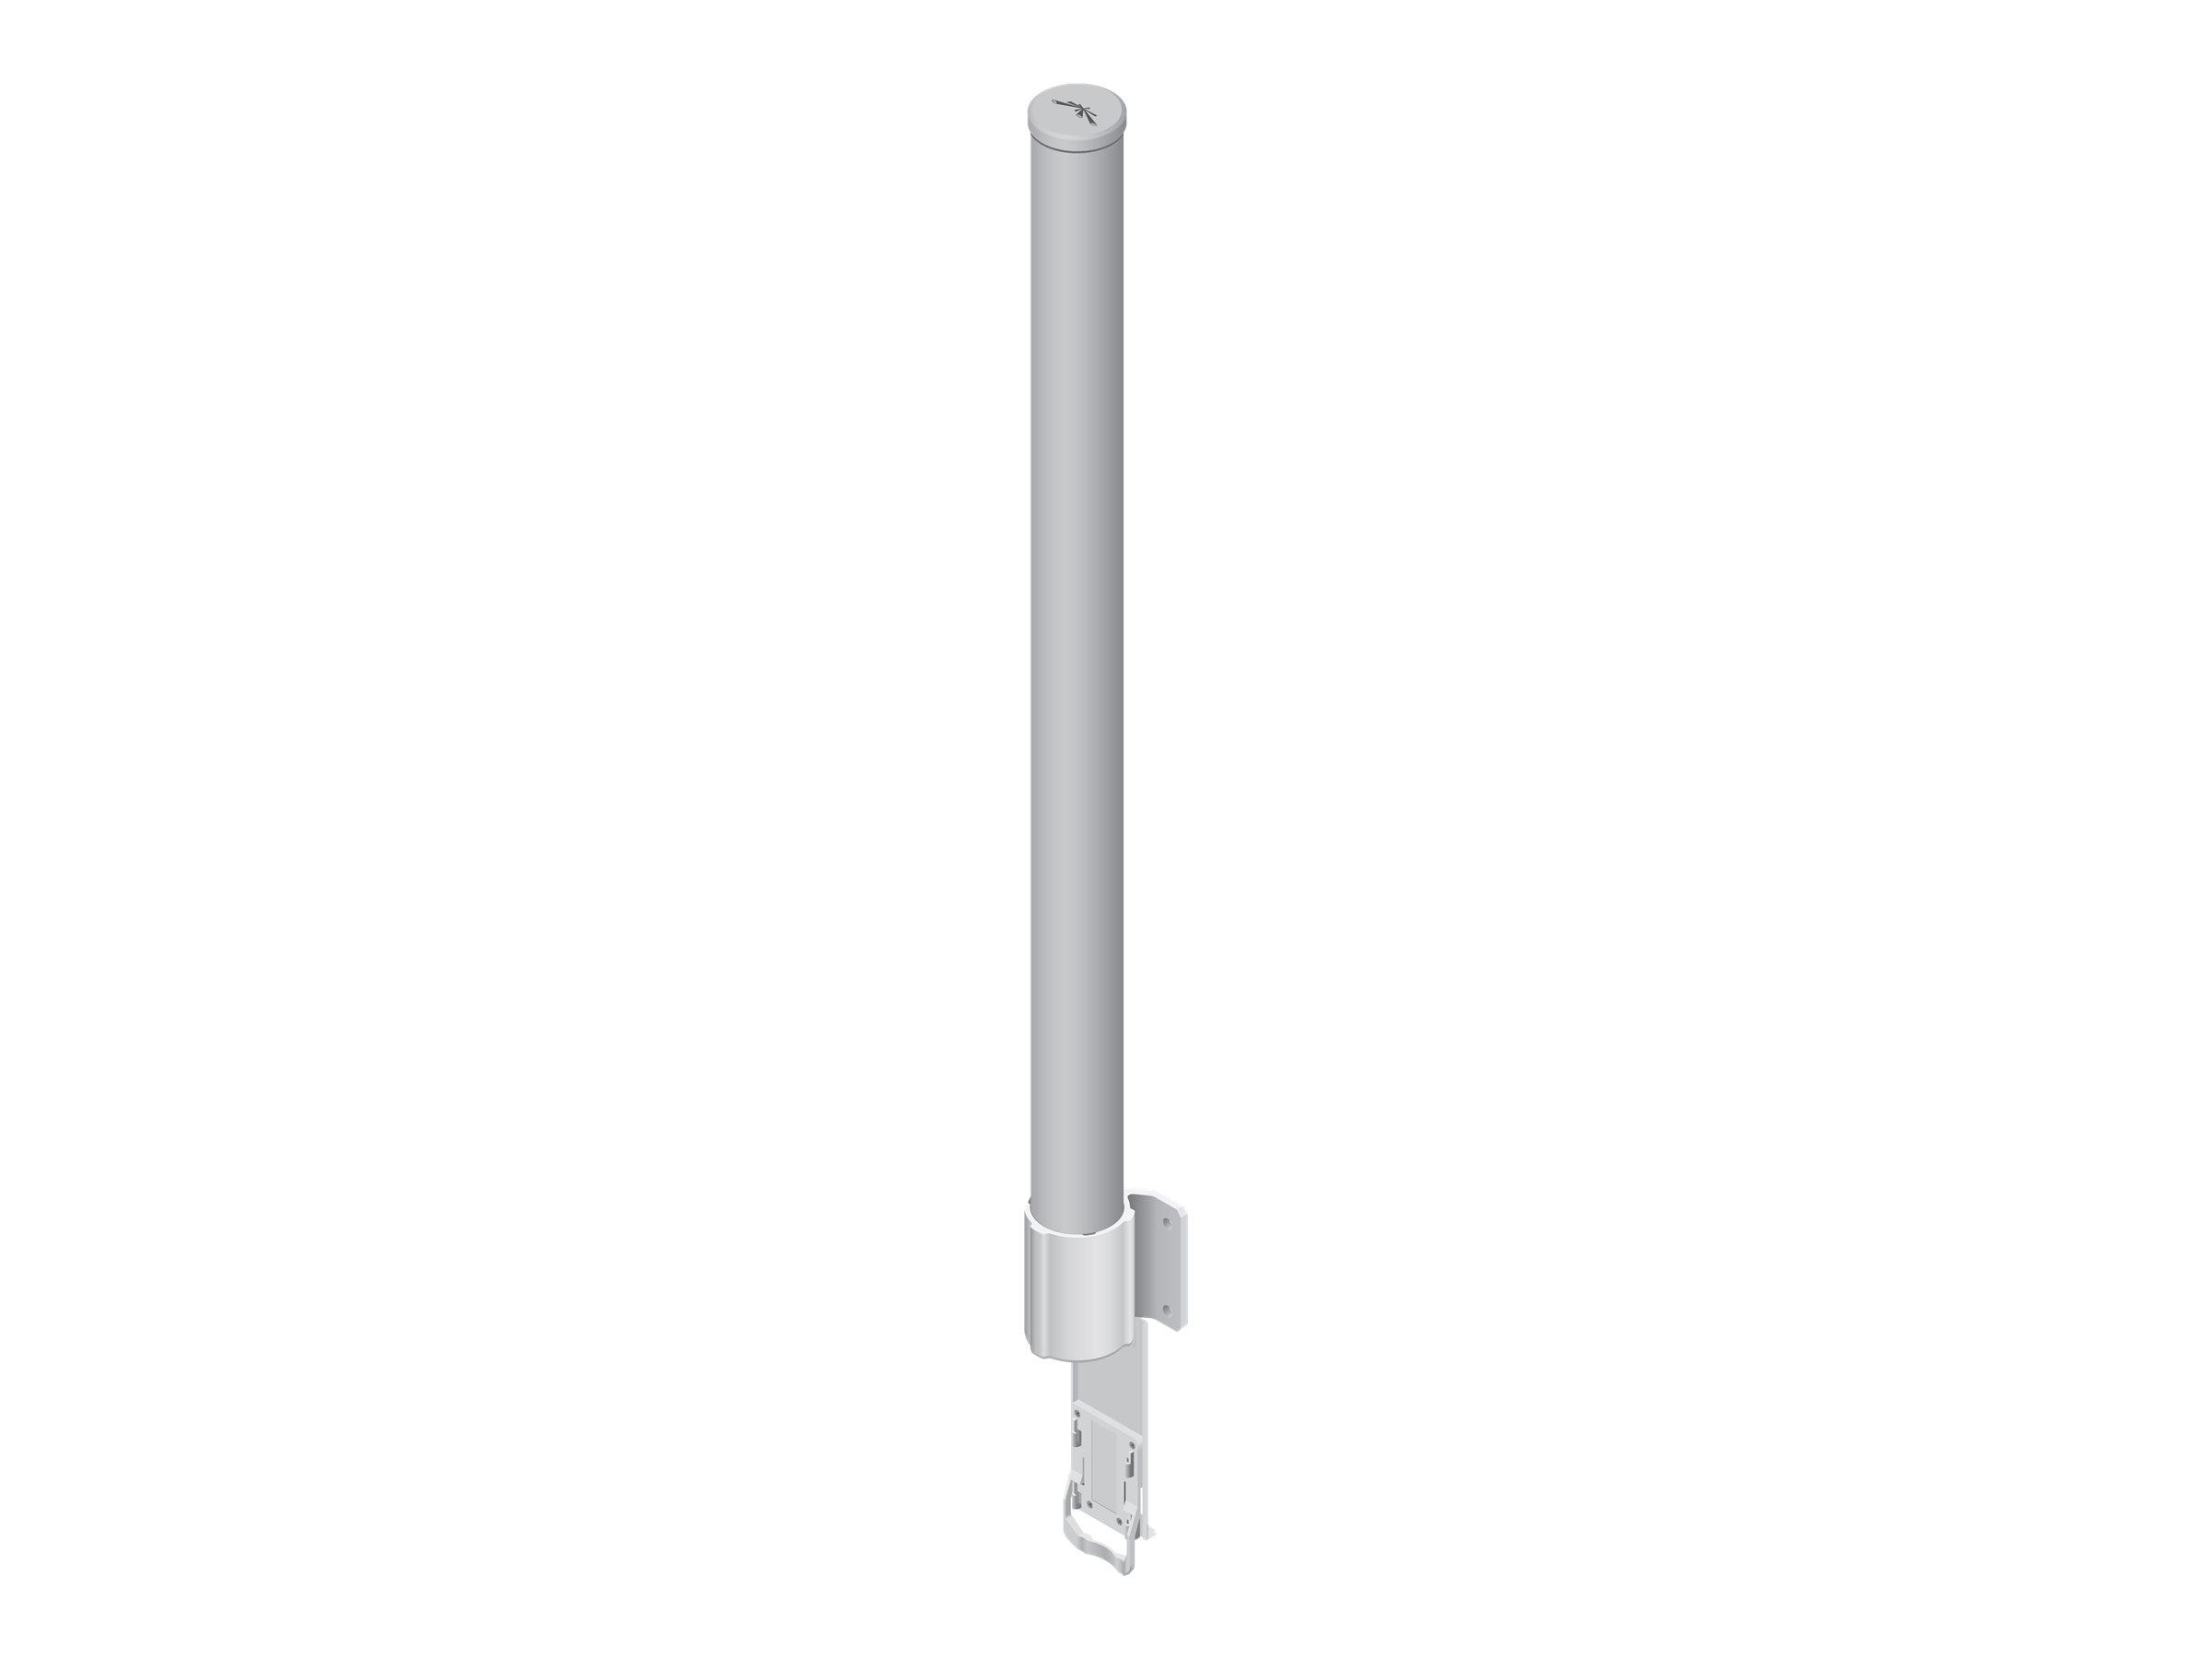 Ubiquiti AirMax Omni AMO-2G13 - antenna